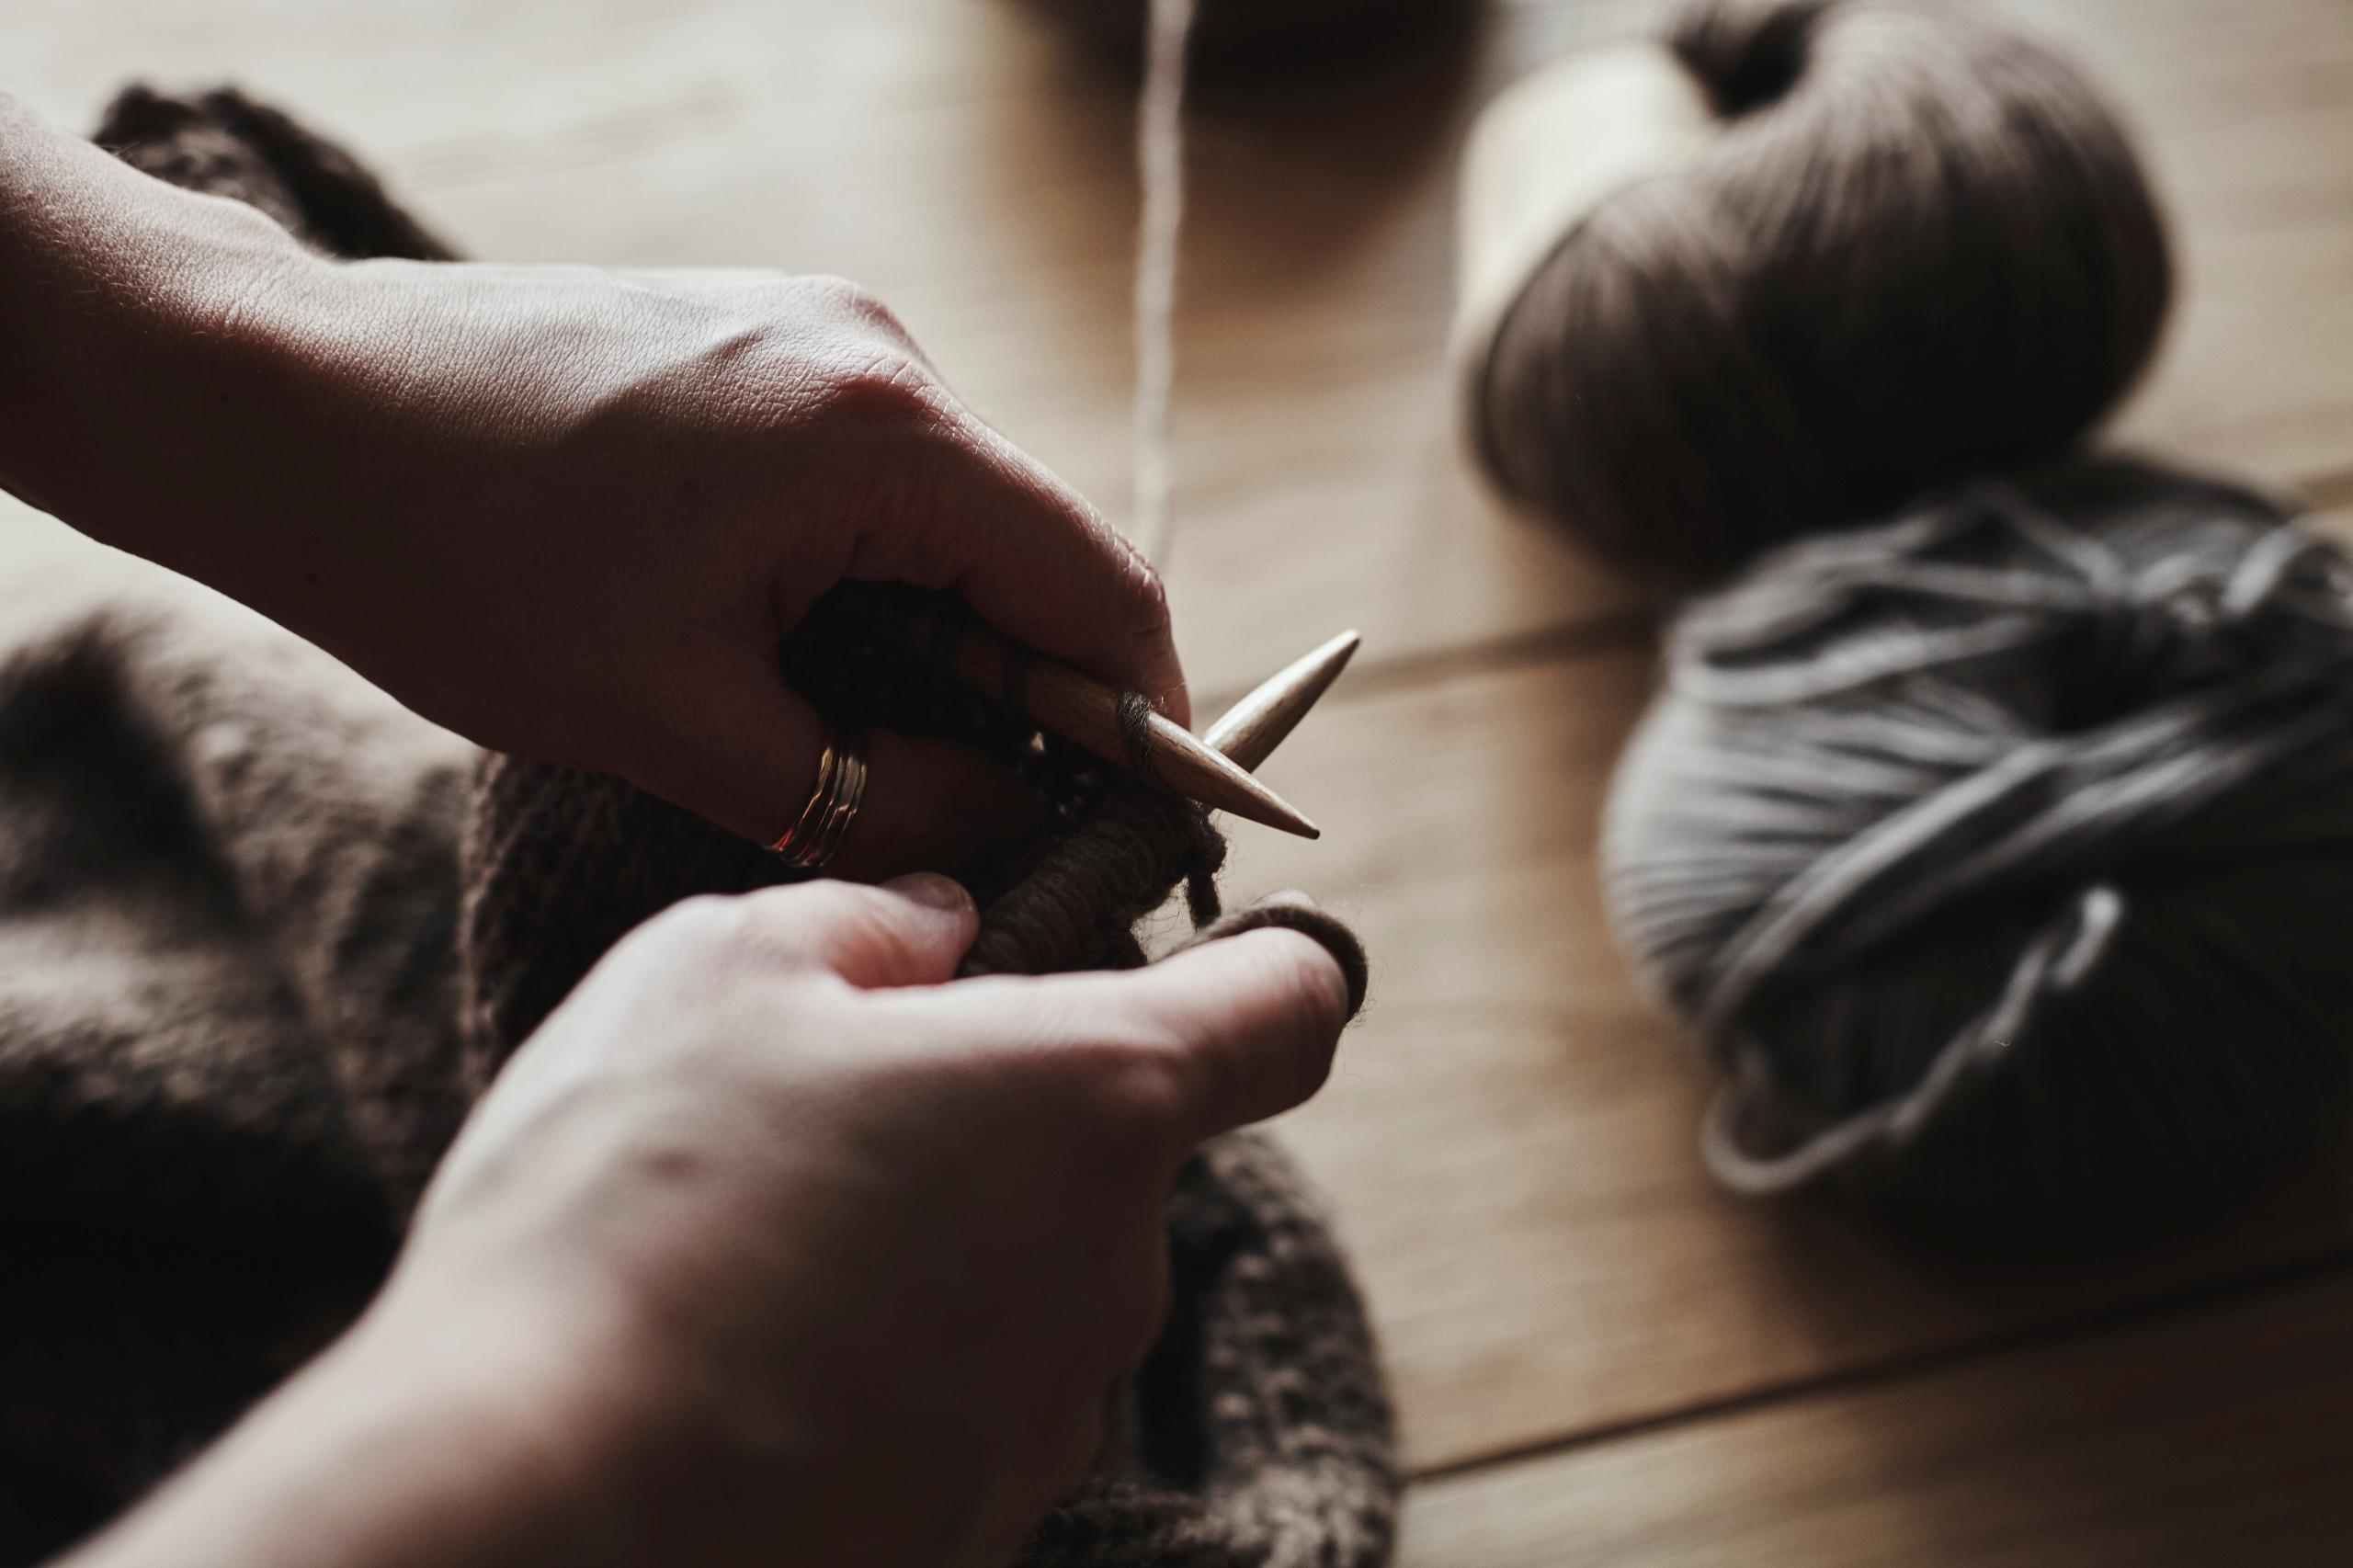 knitting - handmade, slowfashion - lehandmade | ello